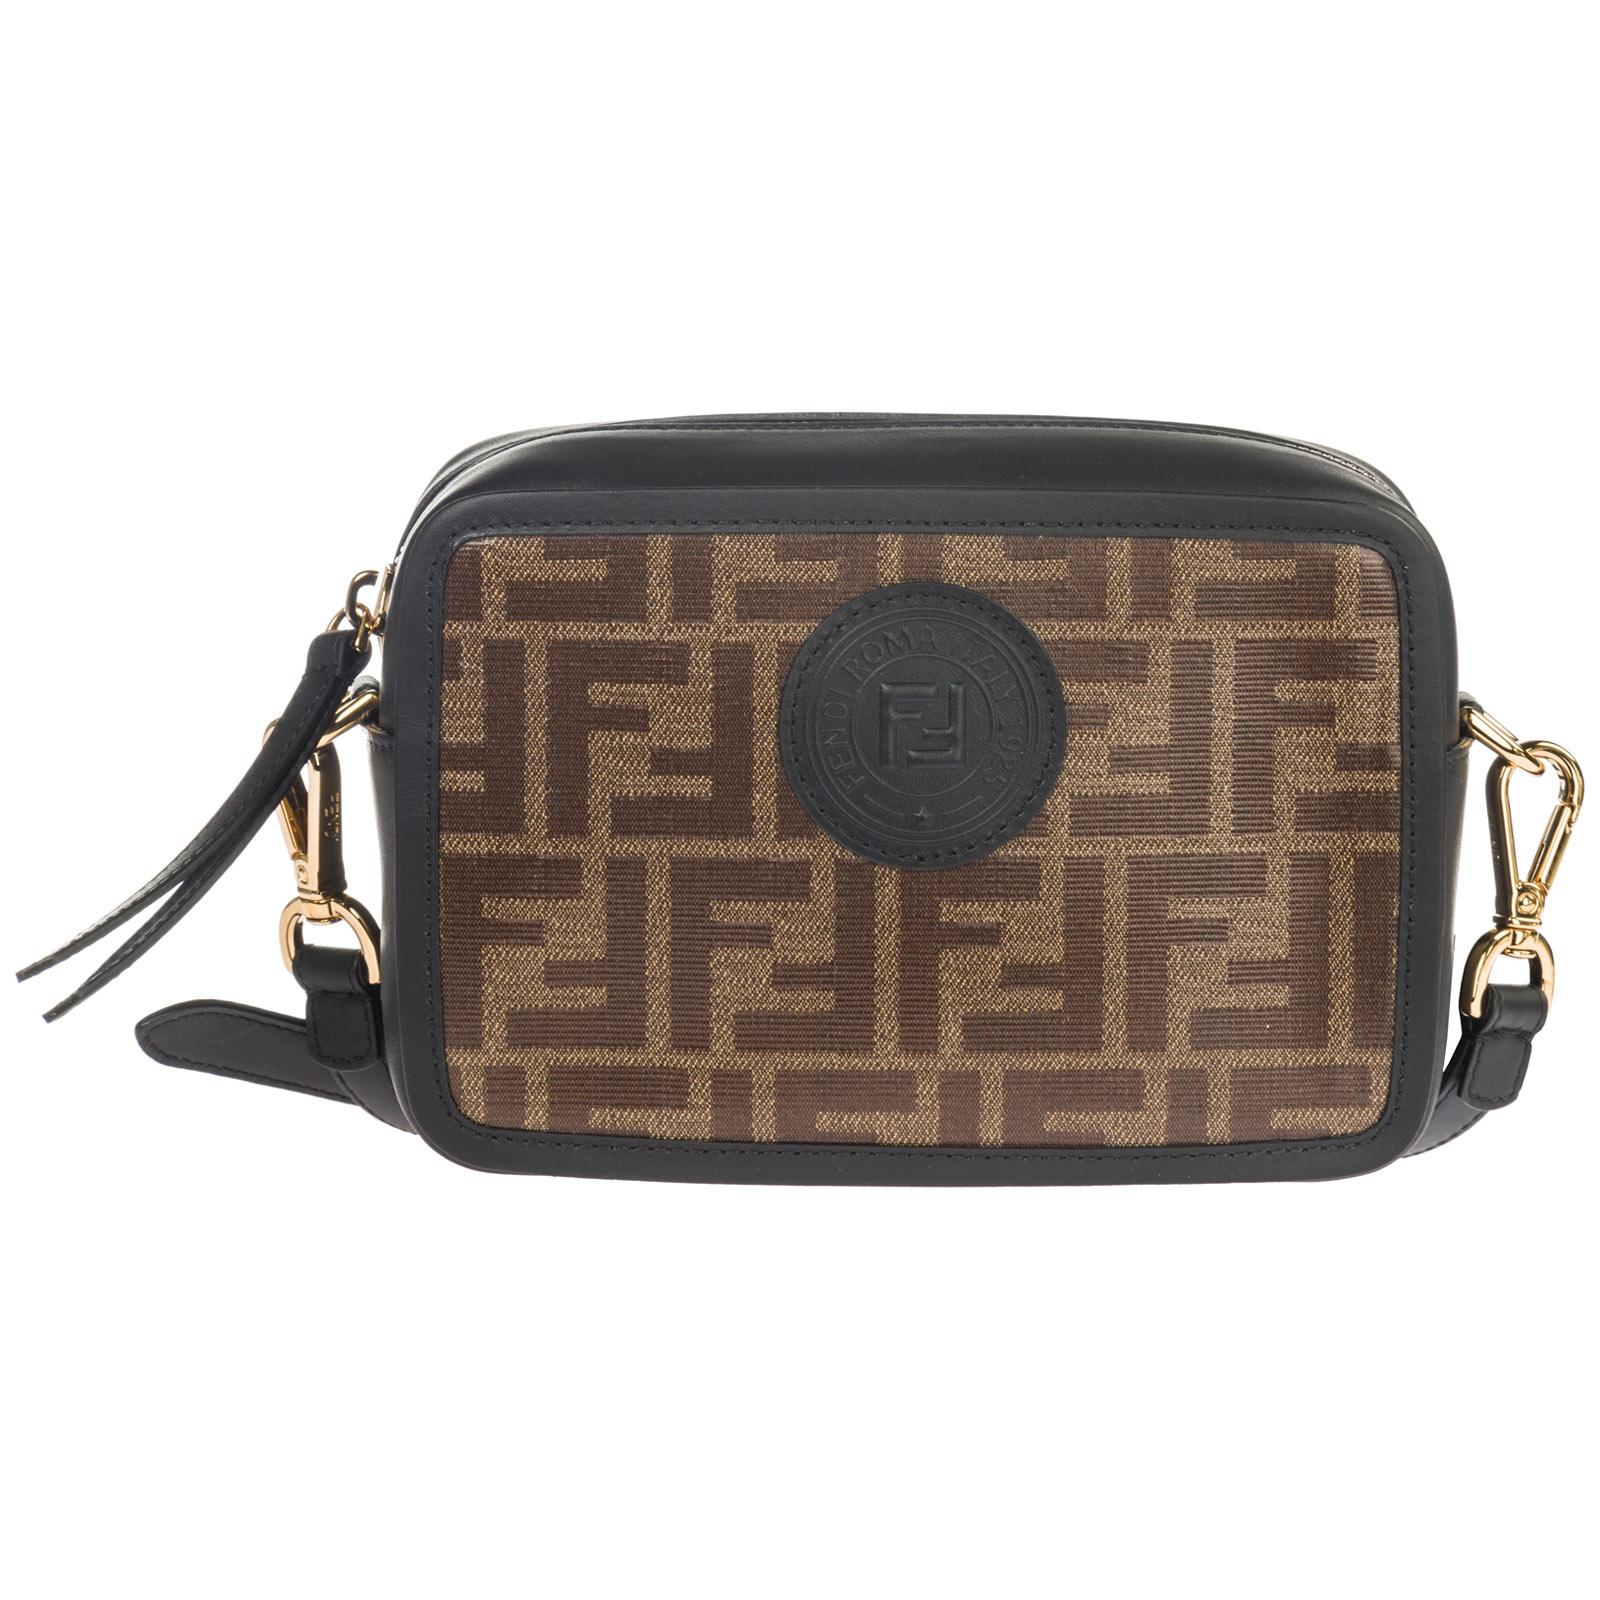 Fendi Women s leather cross-body messenger shoulder bag 6e59e297e4